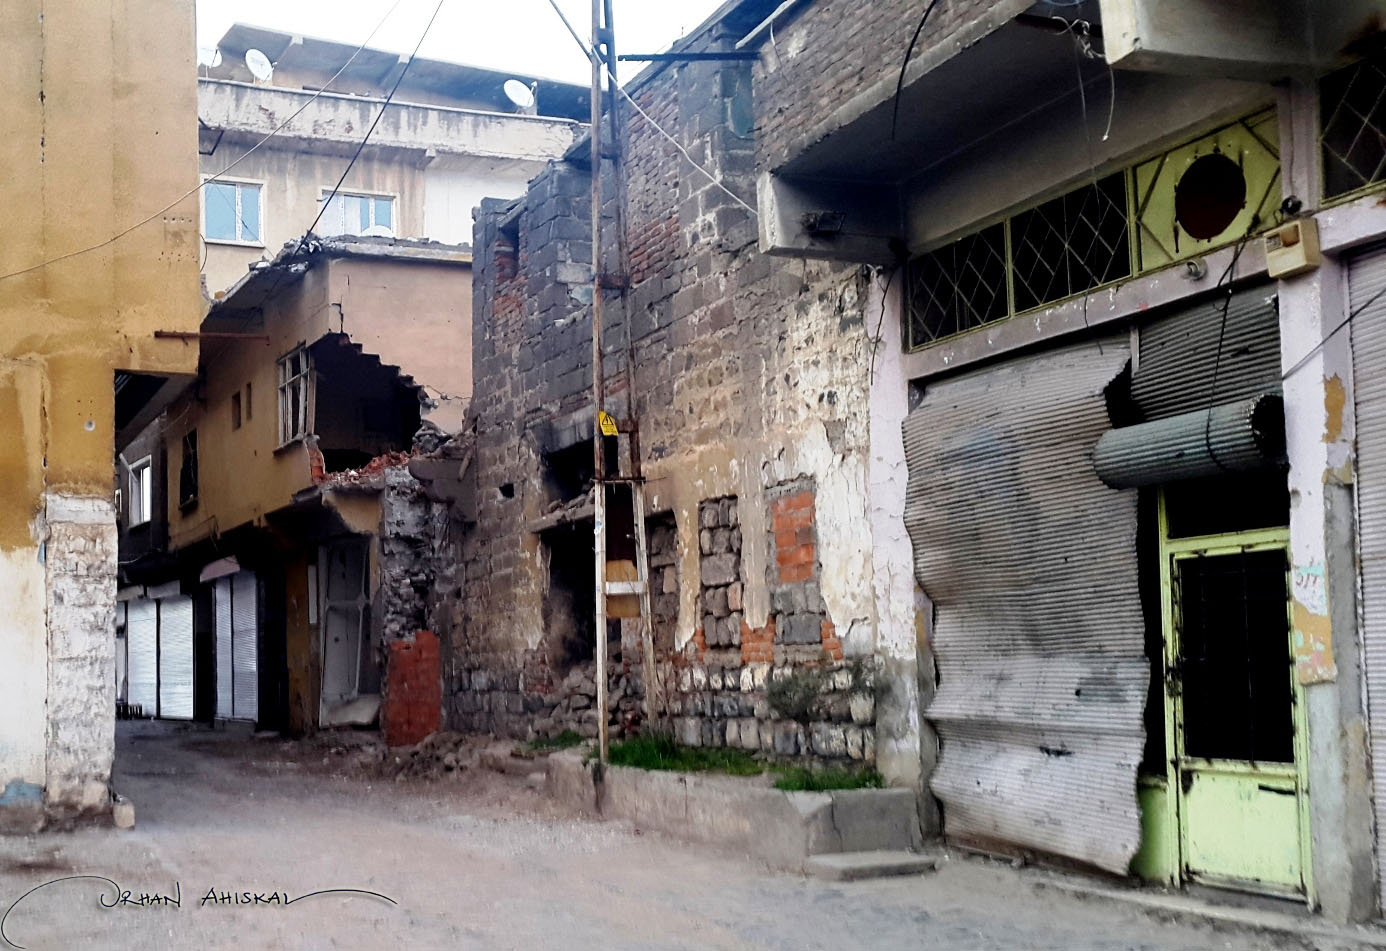 A street at Sur District, Diyarbakır. Photo: Orhan Ahıskal